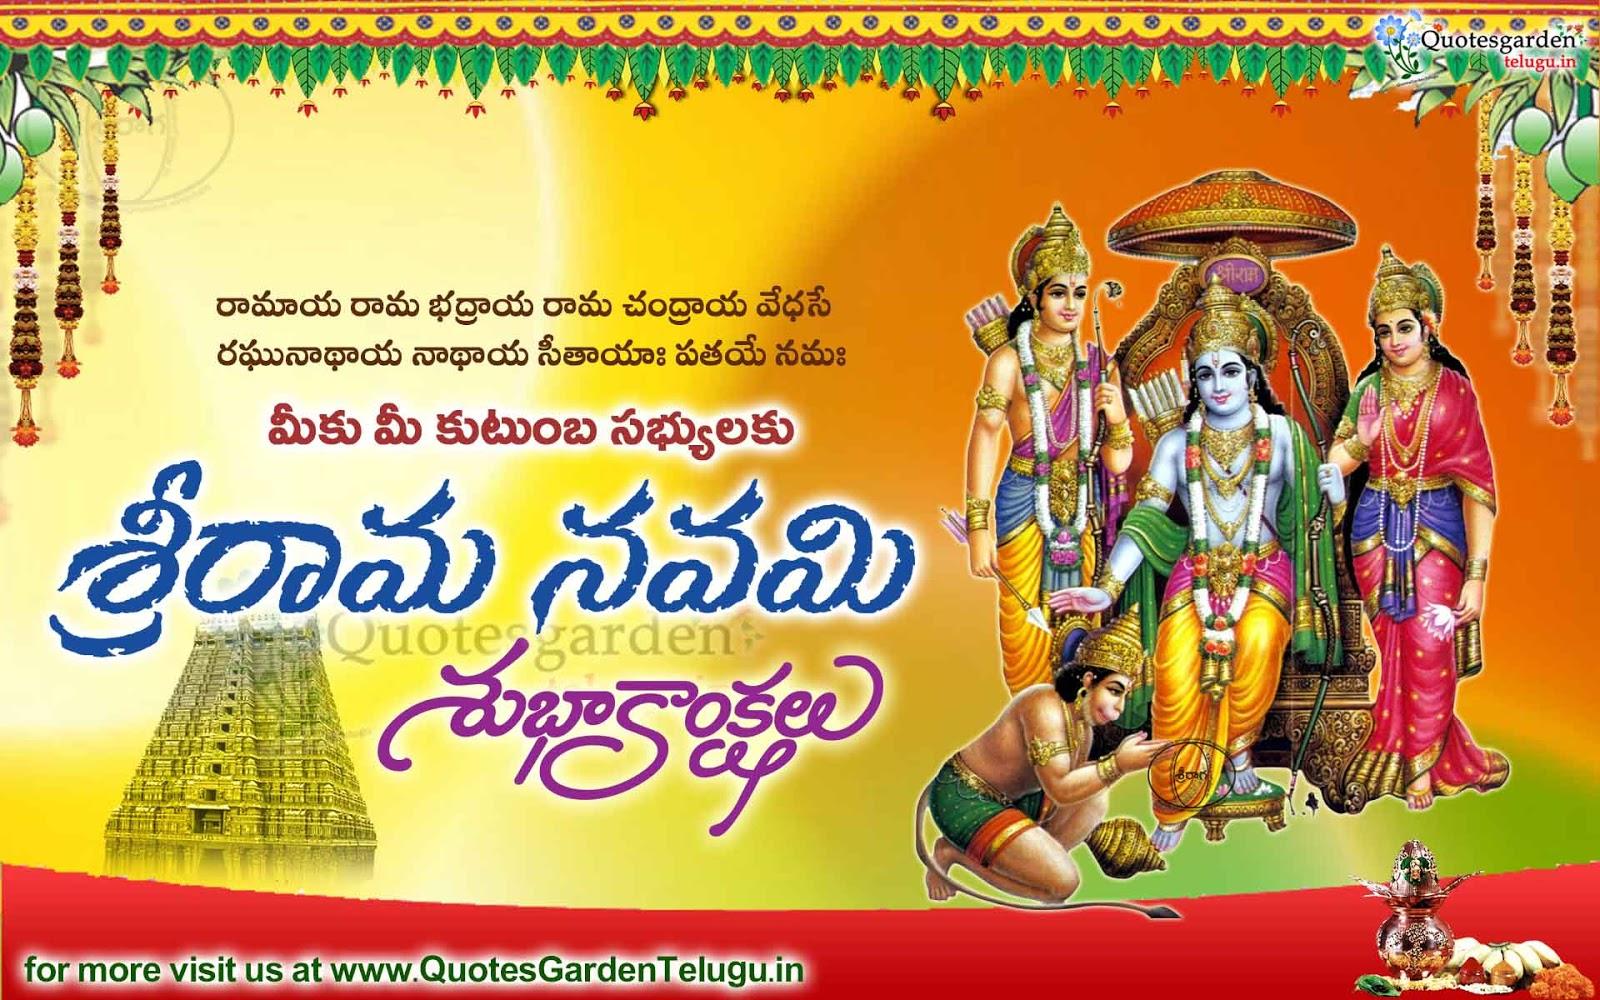 Telugu sri rama navami 2017 greetings quotes wishes quotes garden telugu sri rama navami wishes greetings sri rama navami greetings wallpapers m4hsunfo